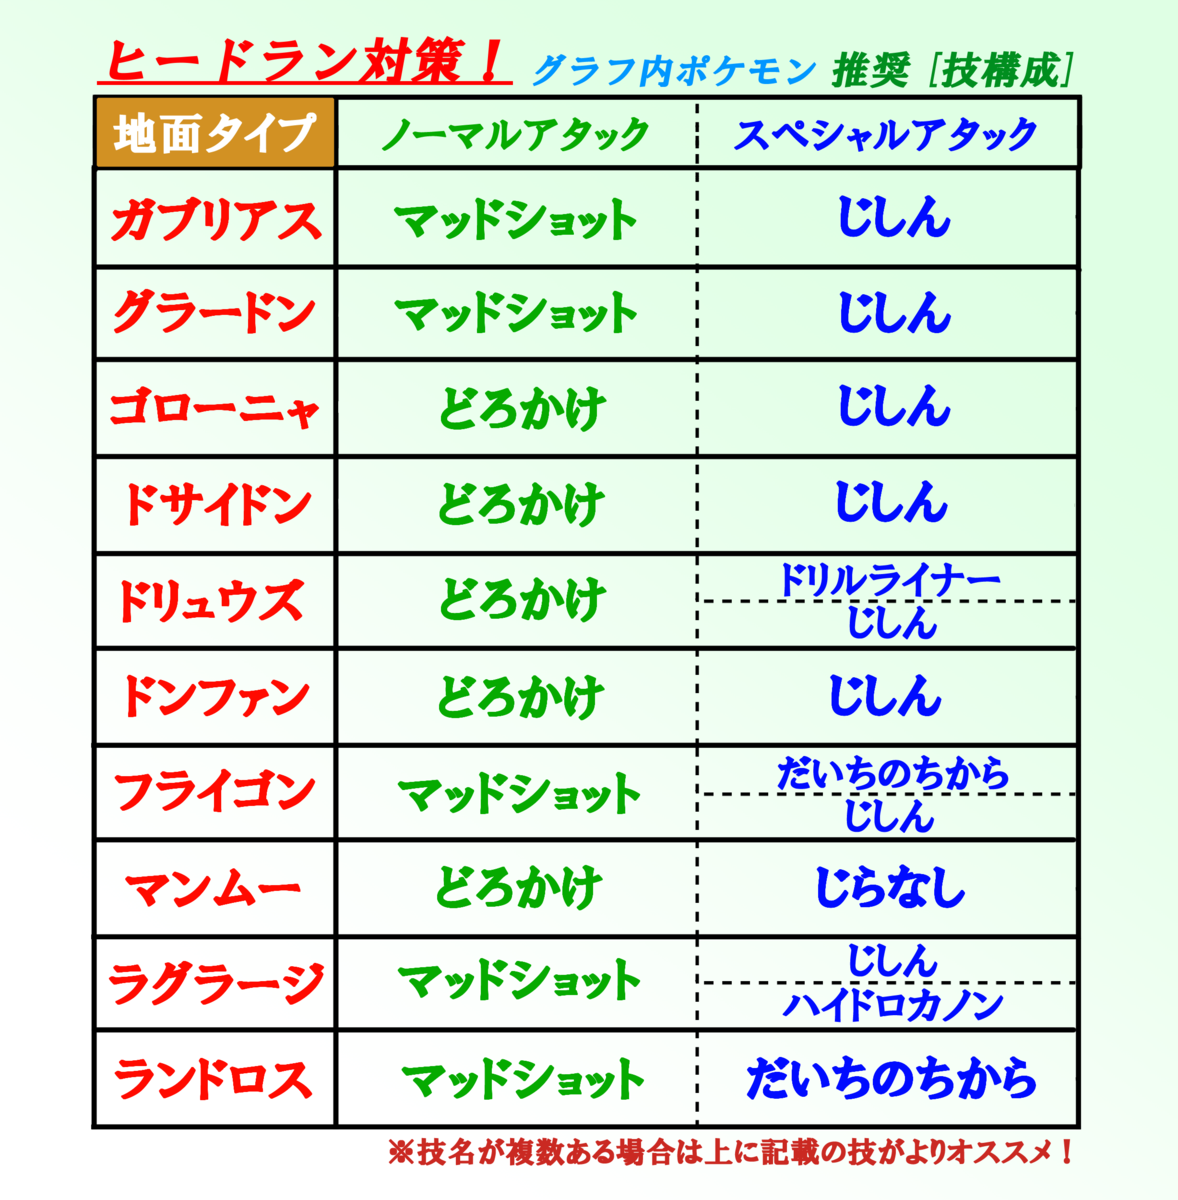 f:id:Kazumin0331:20200823000602p:plain